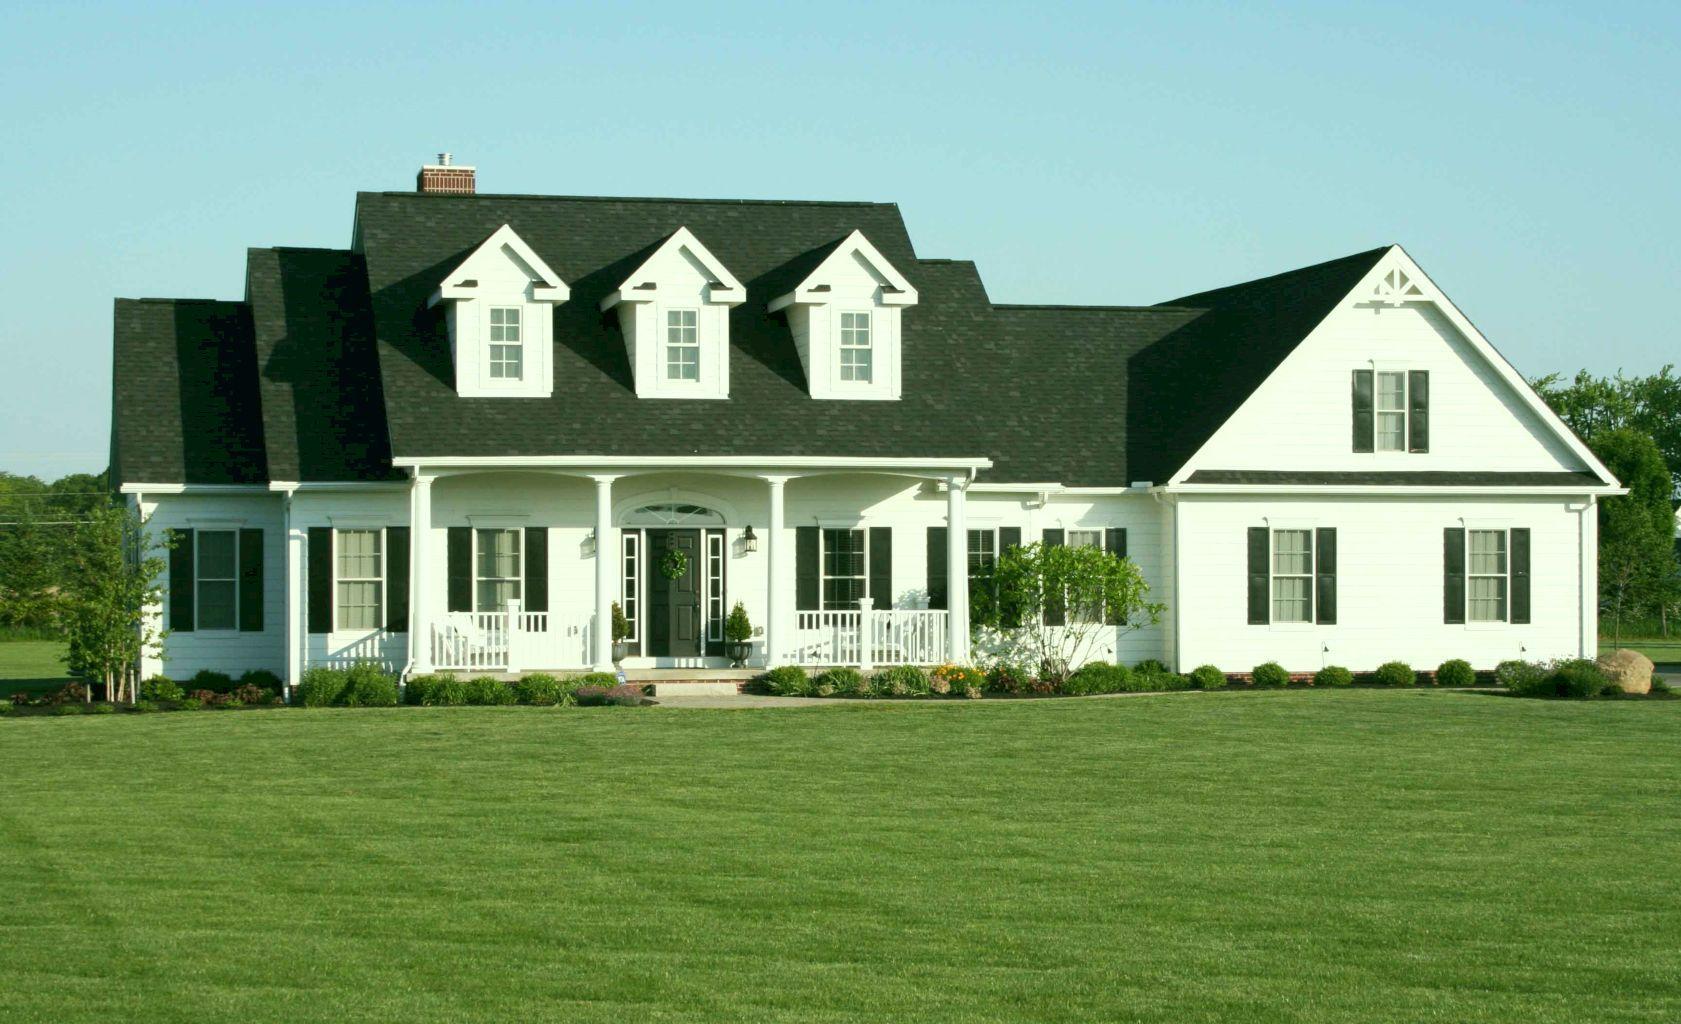 Cape Cod Exterior Ideas Part - 17: 50 Traditional Cape Cod House Exterior Ideas